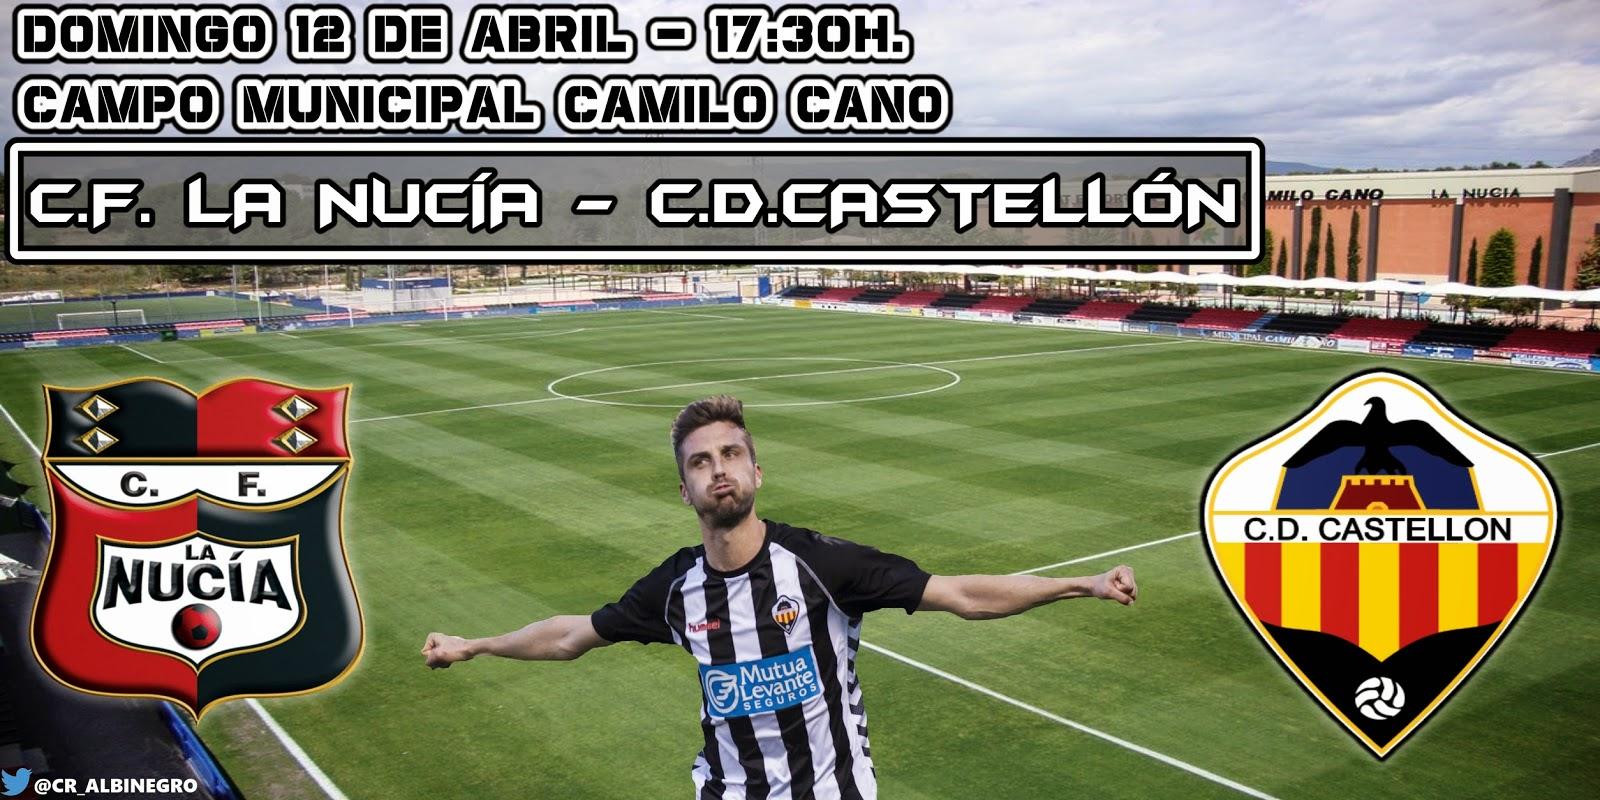 Actualidad c d castell n plan de trabajo semanal del cd for Piscina municipal camilo cano